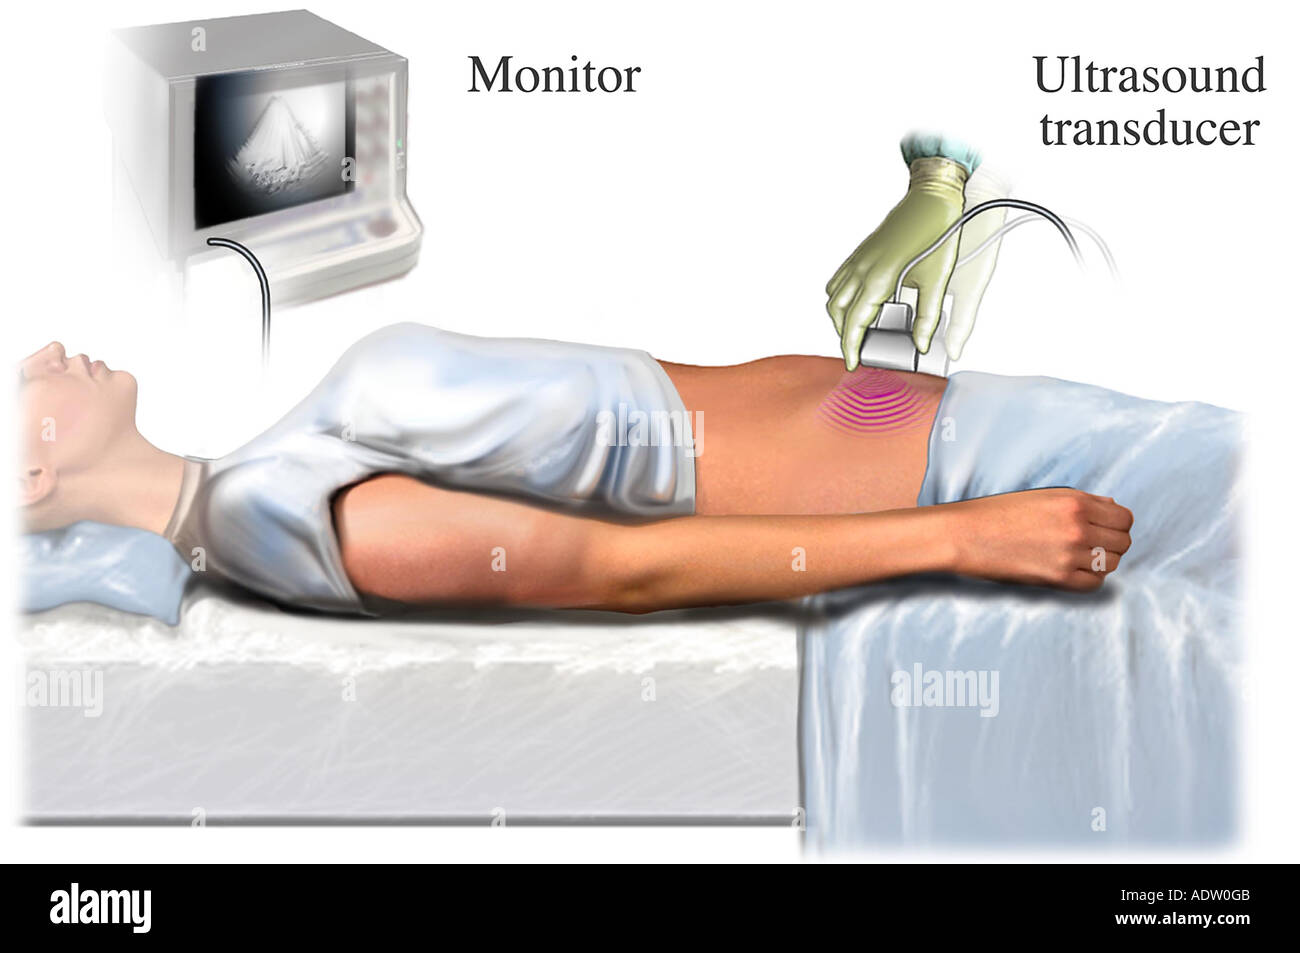 Pelvic Ultrasound - Stock Image